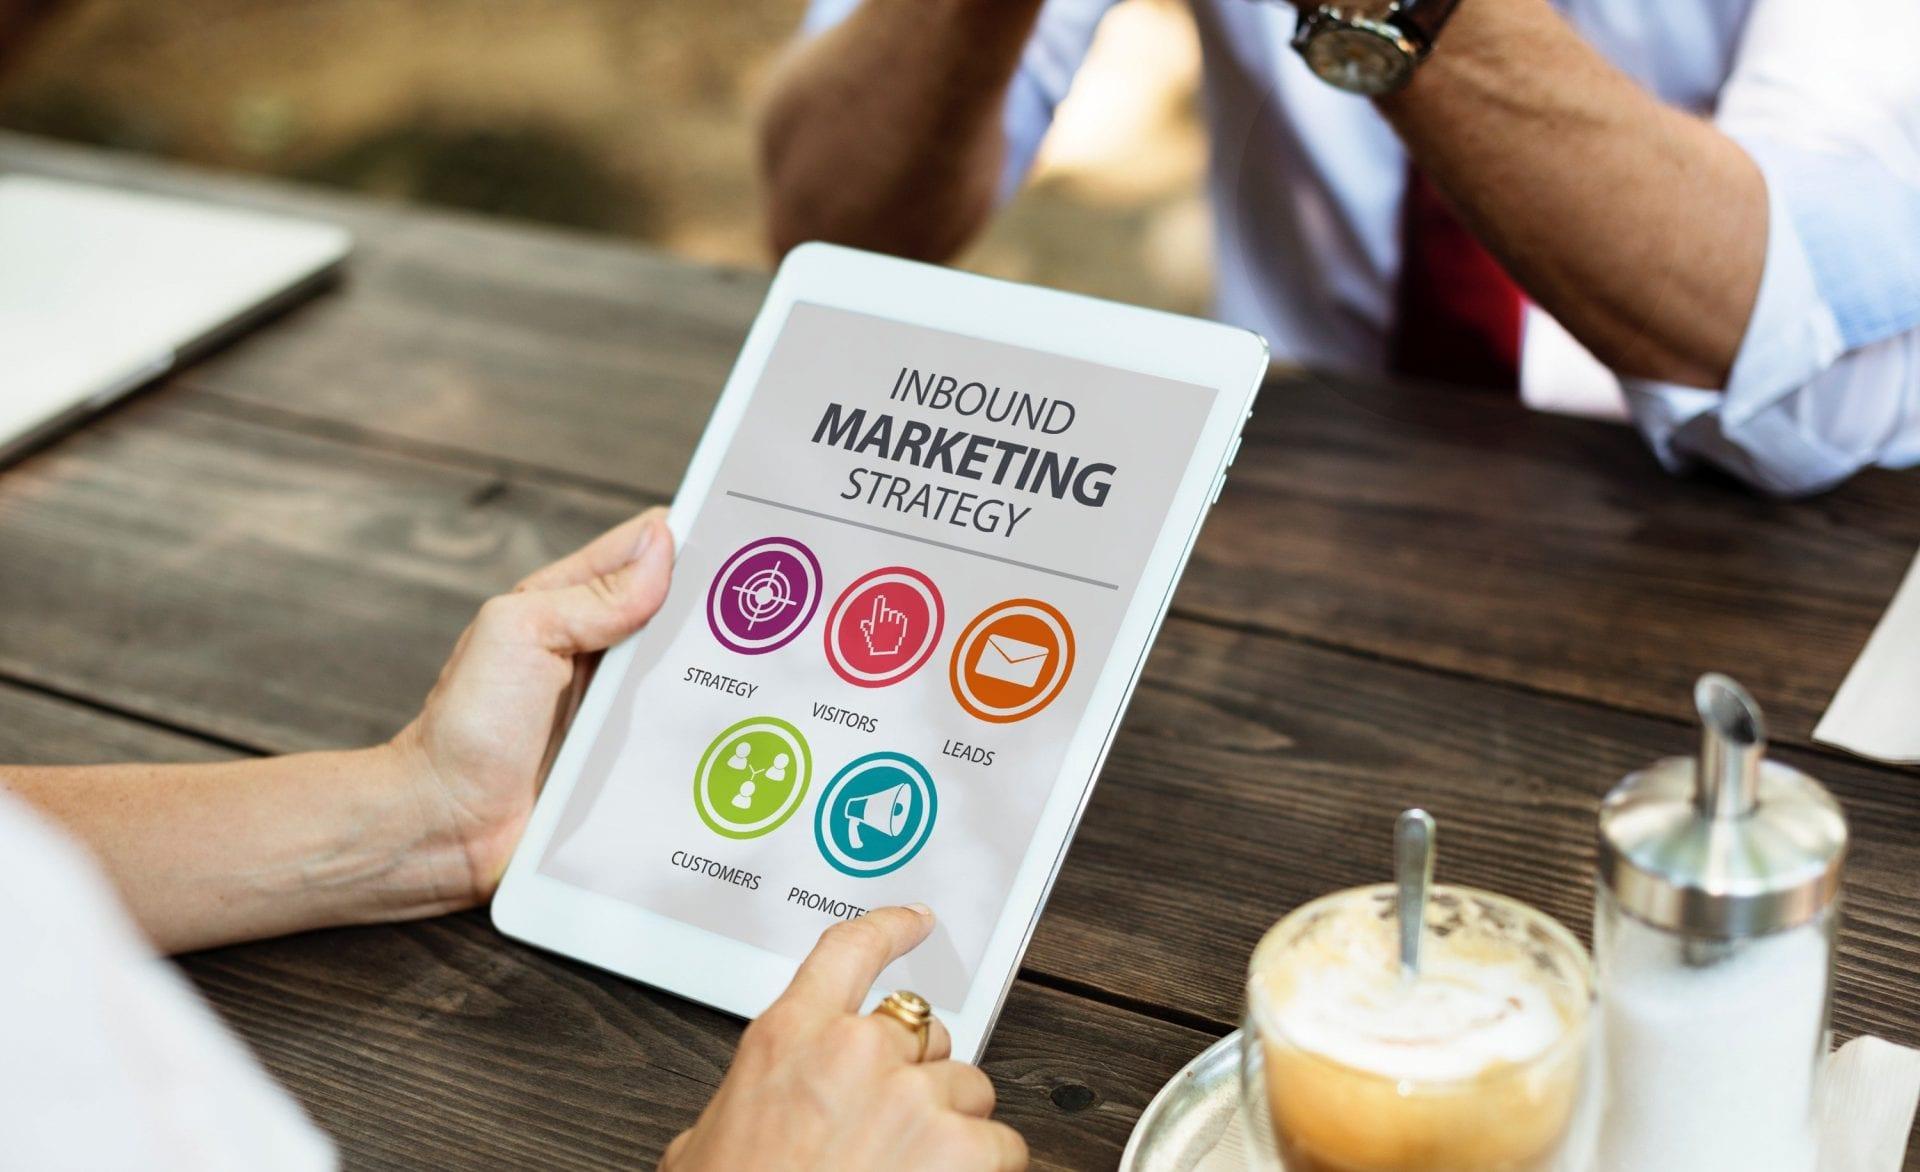 Digital Marketing Agency - Leicester Based SEO & Creative Design Agency